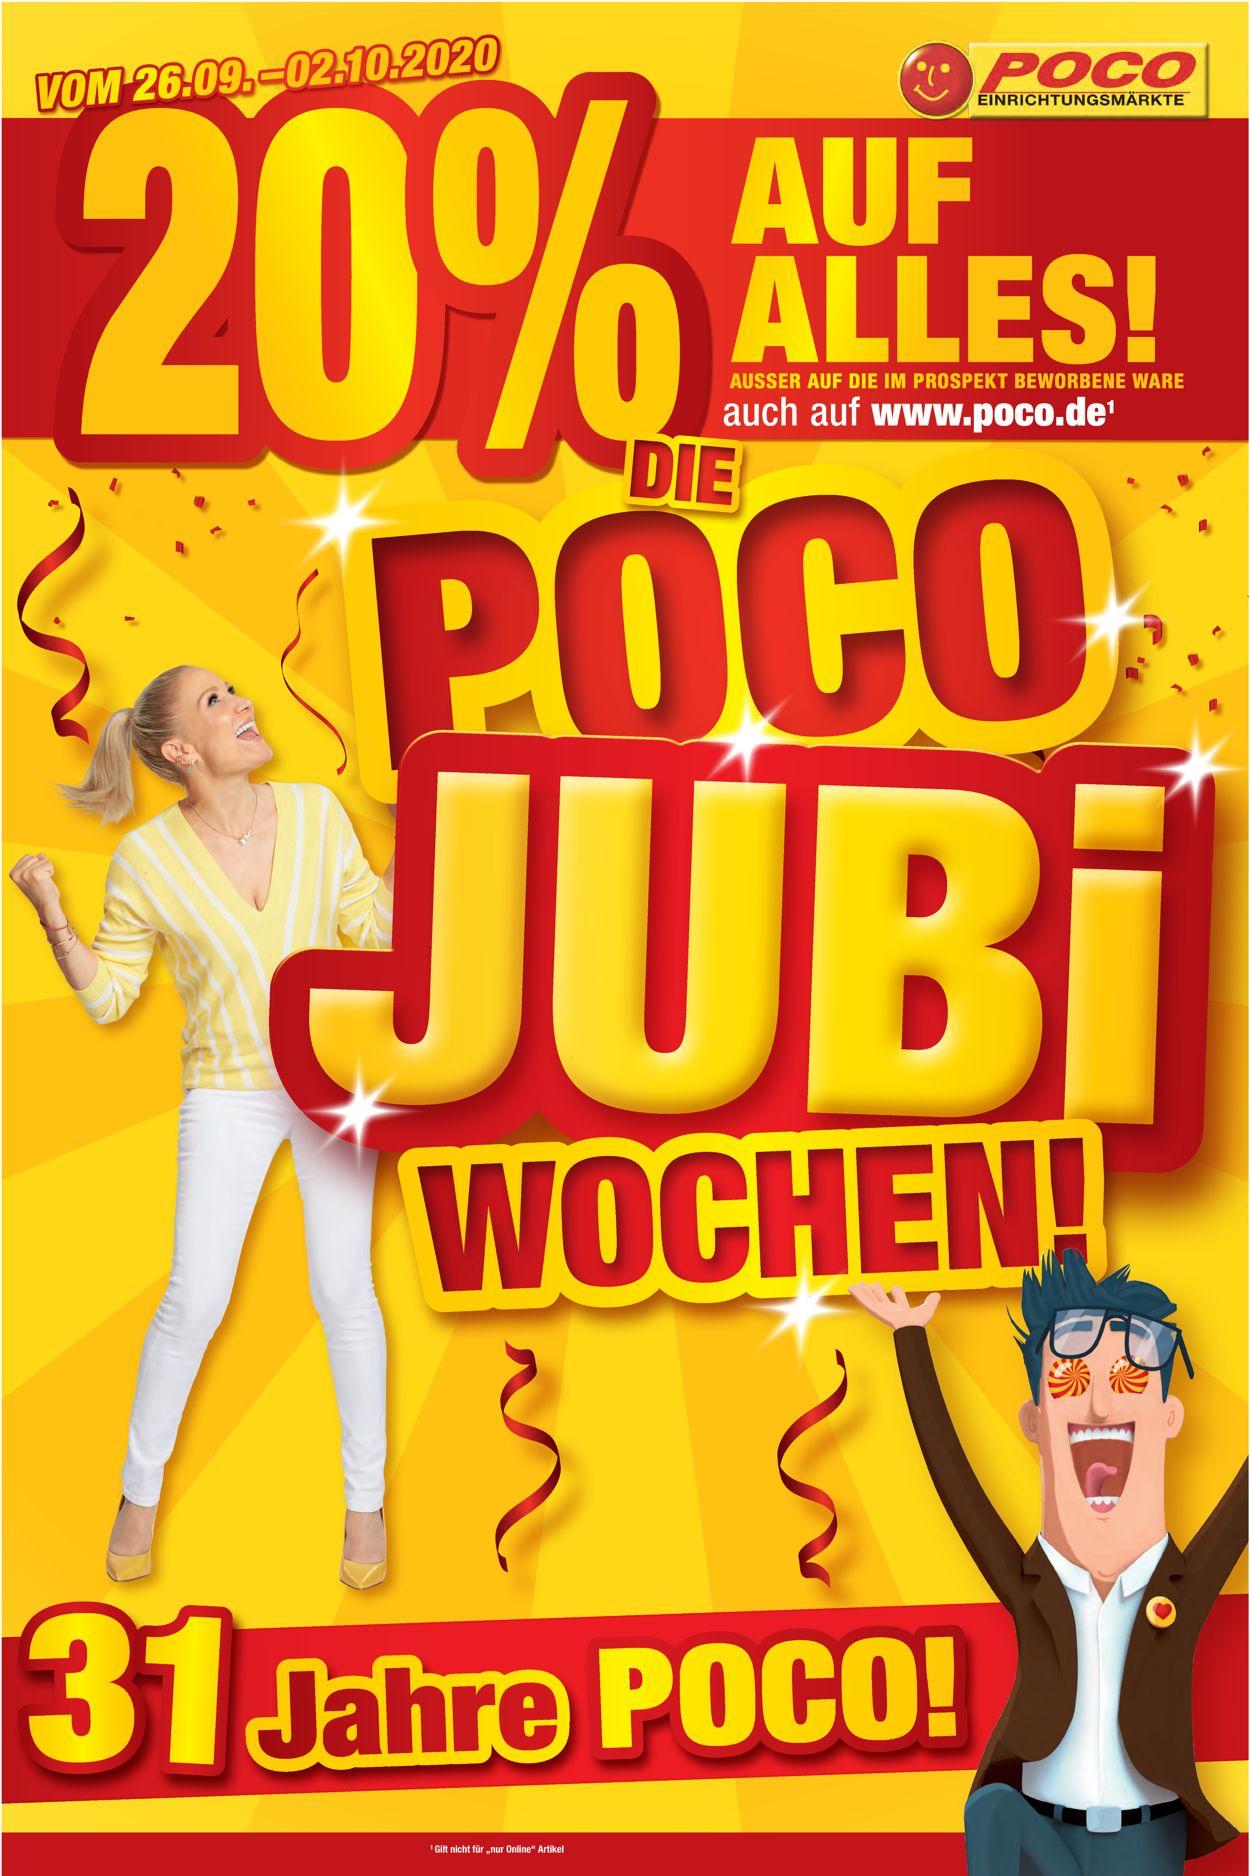 Poco Prospekt - Aktuell vom 26.09-02.10.2020